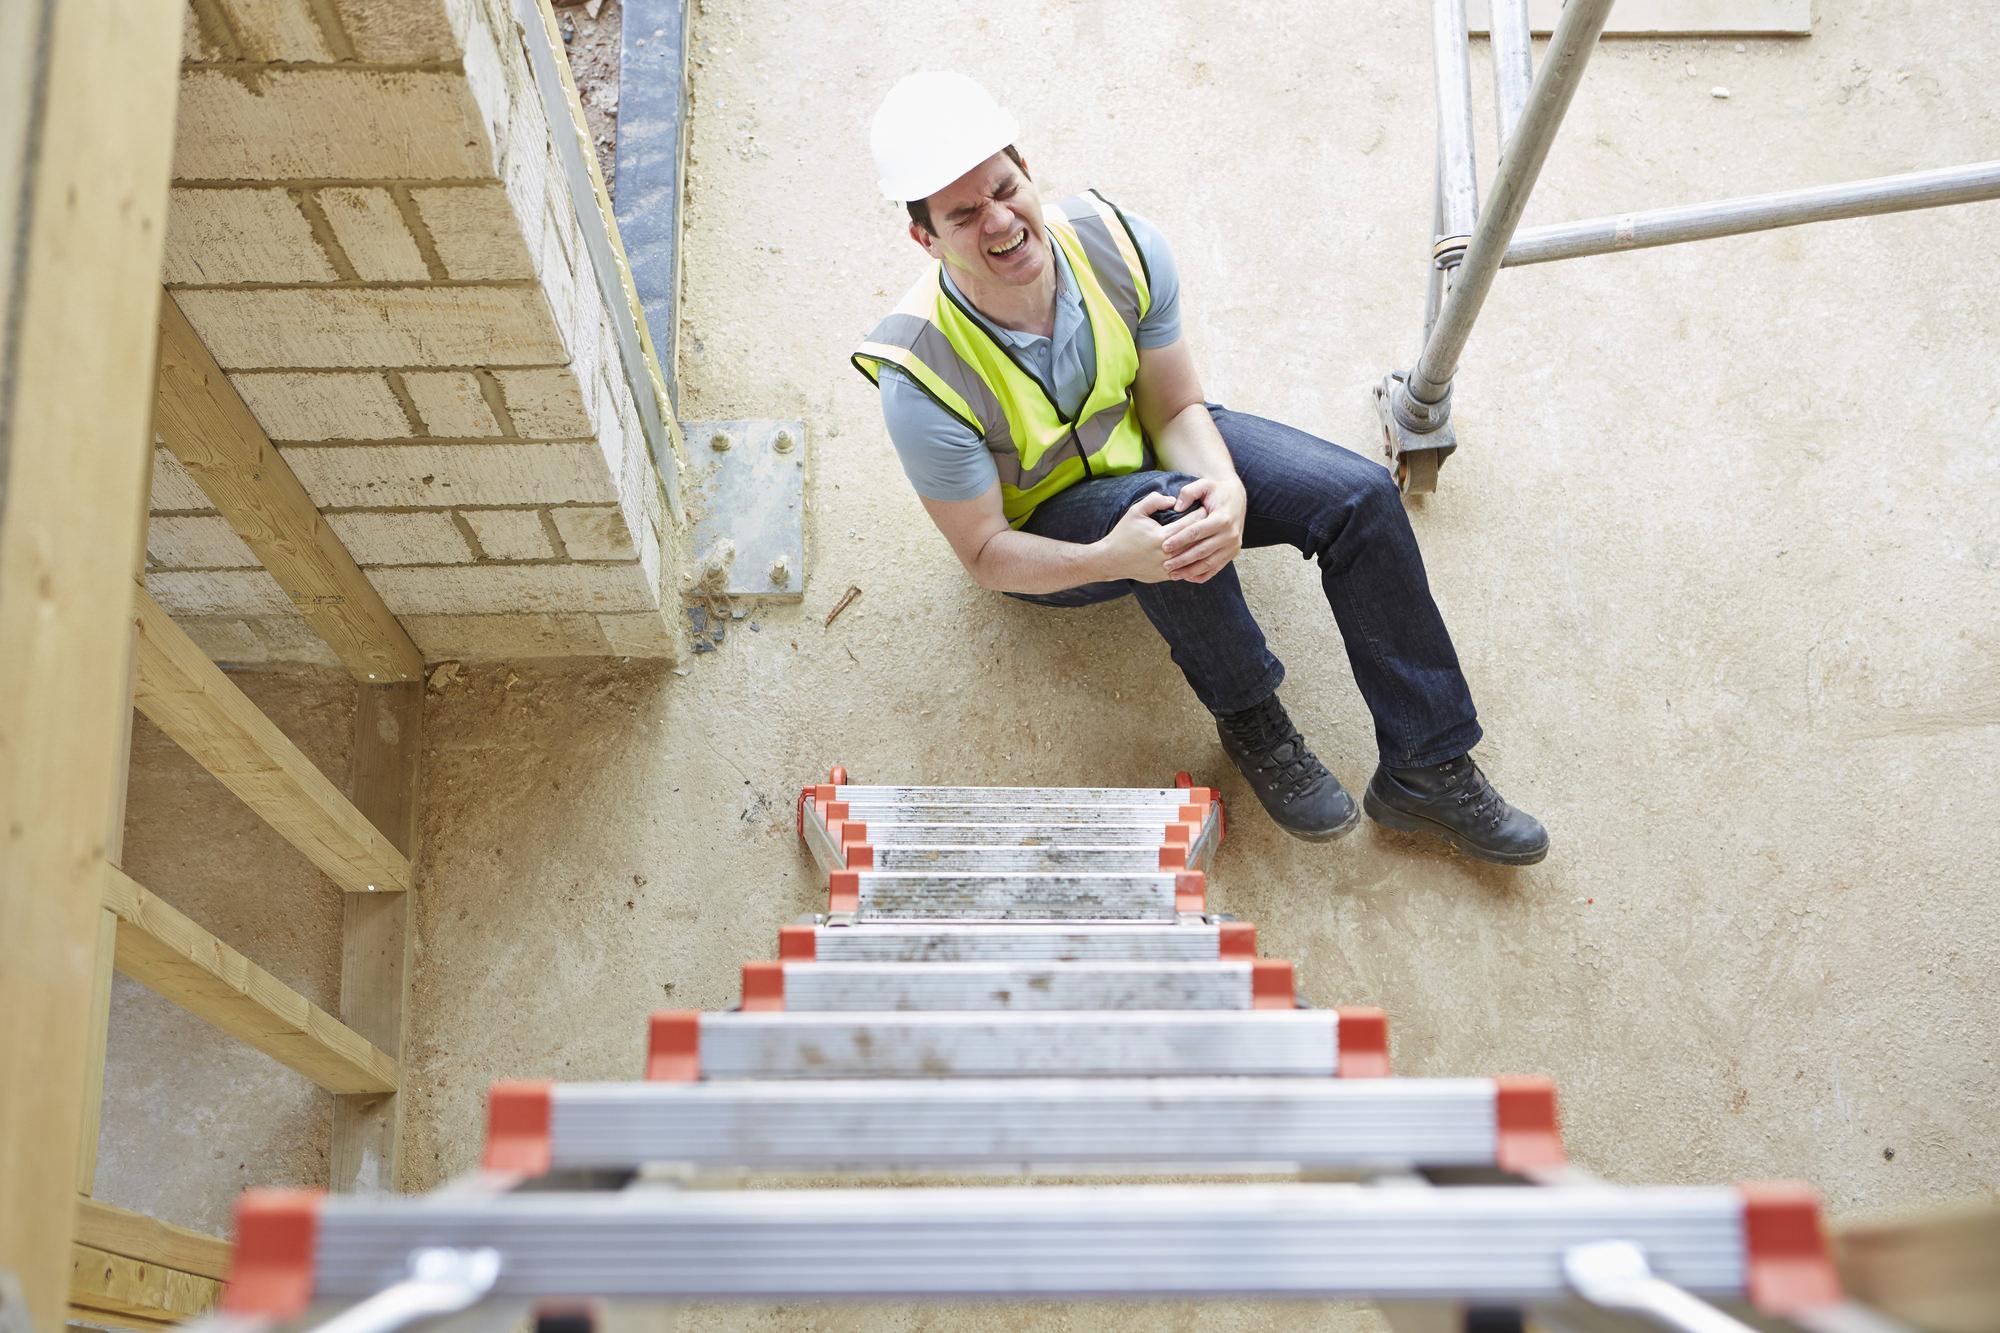 workers compensation lawsuit